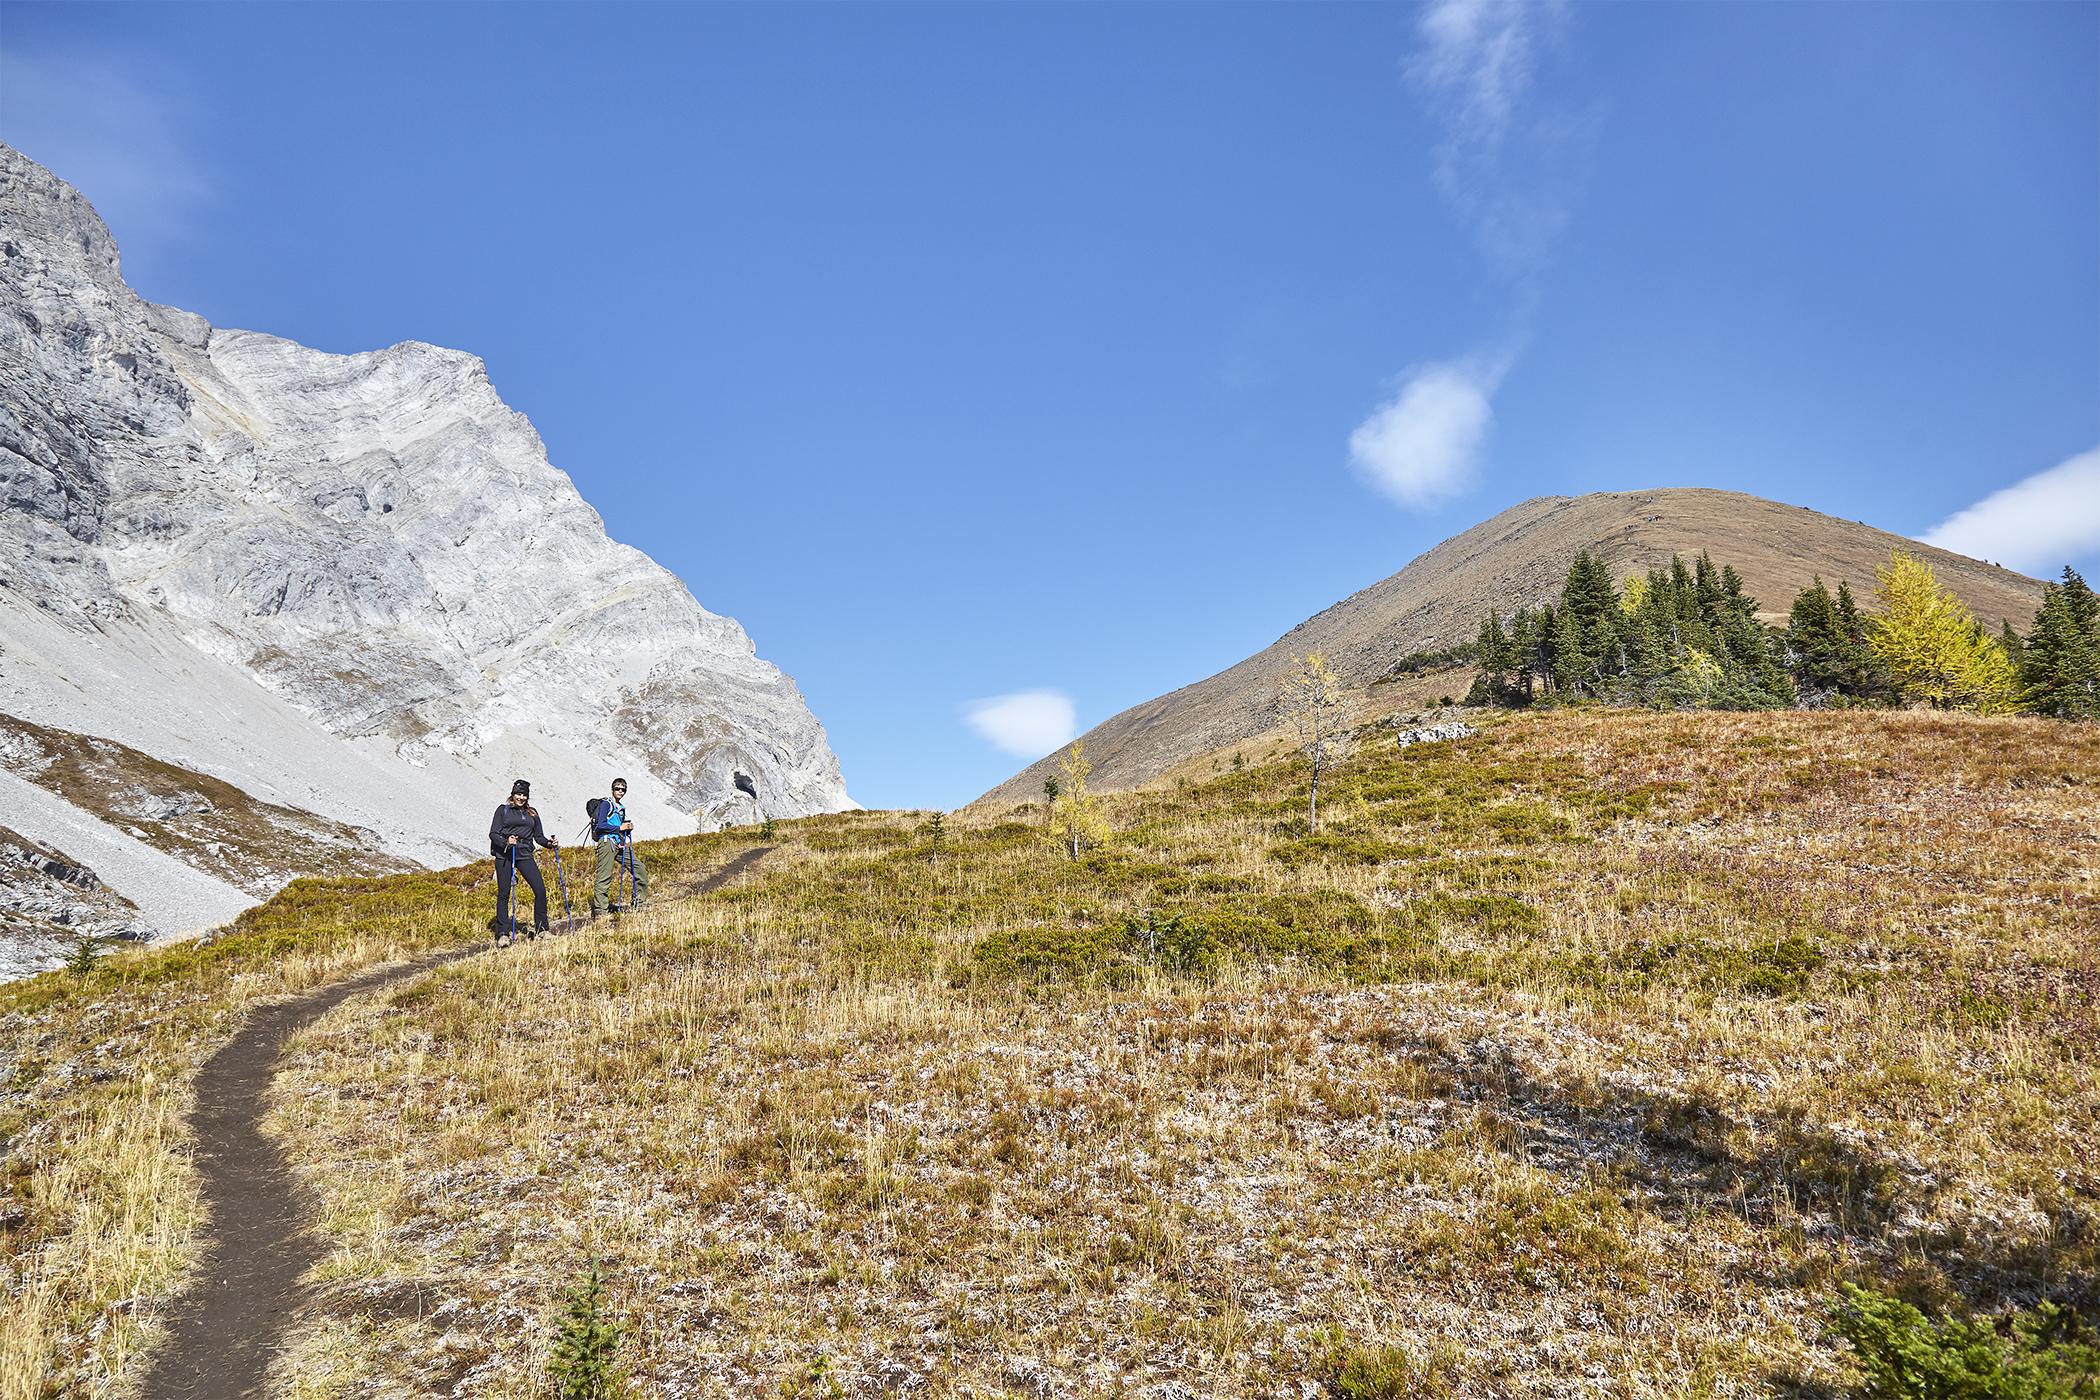 Nadien and Yuri start up the below slopes of Pocaterra Ridge.